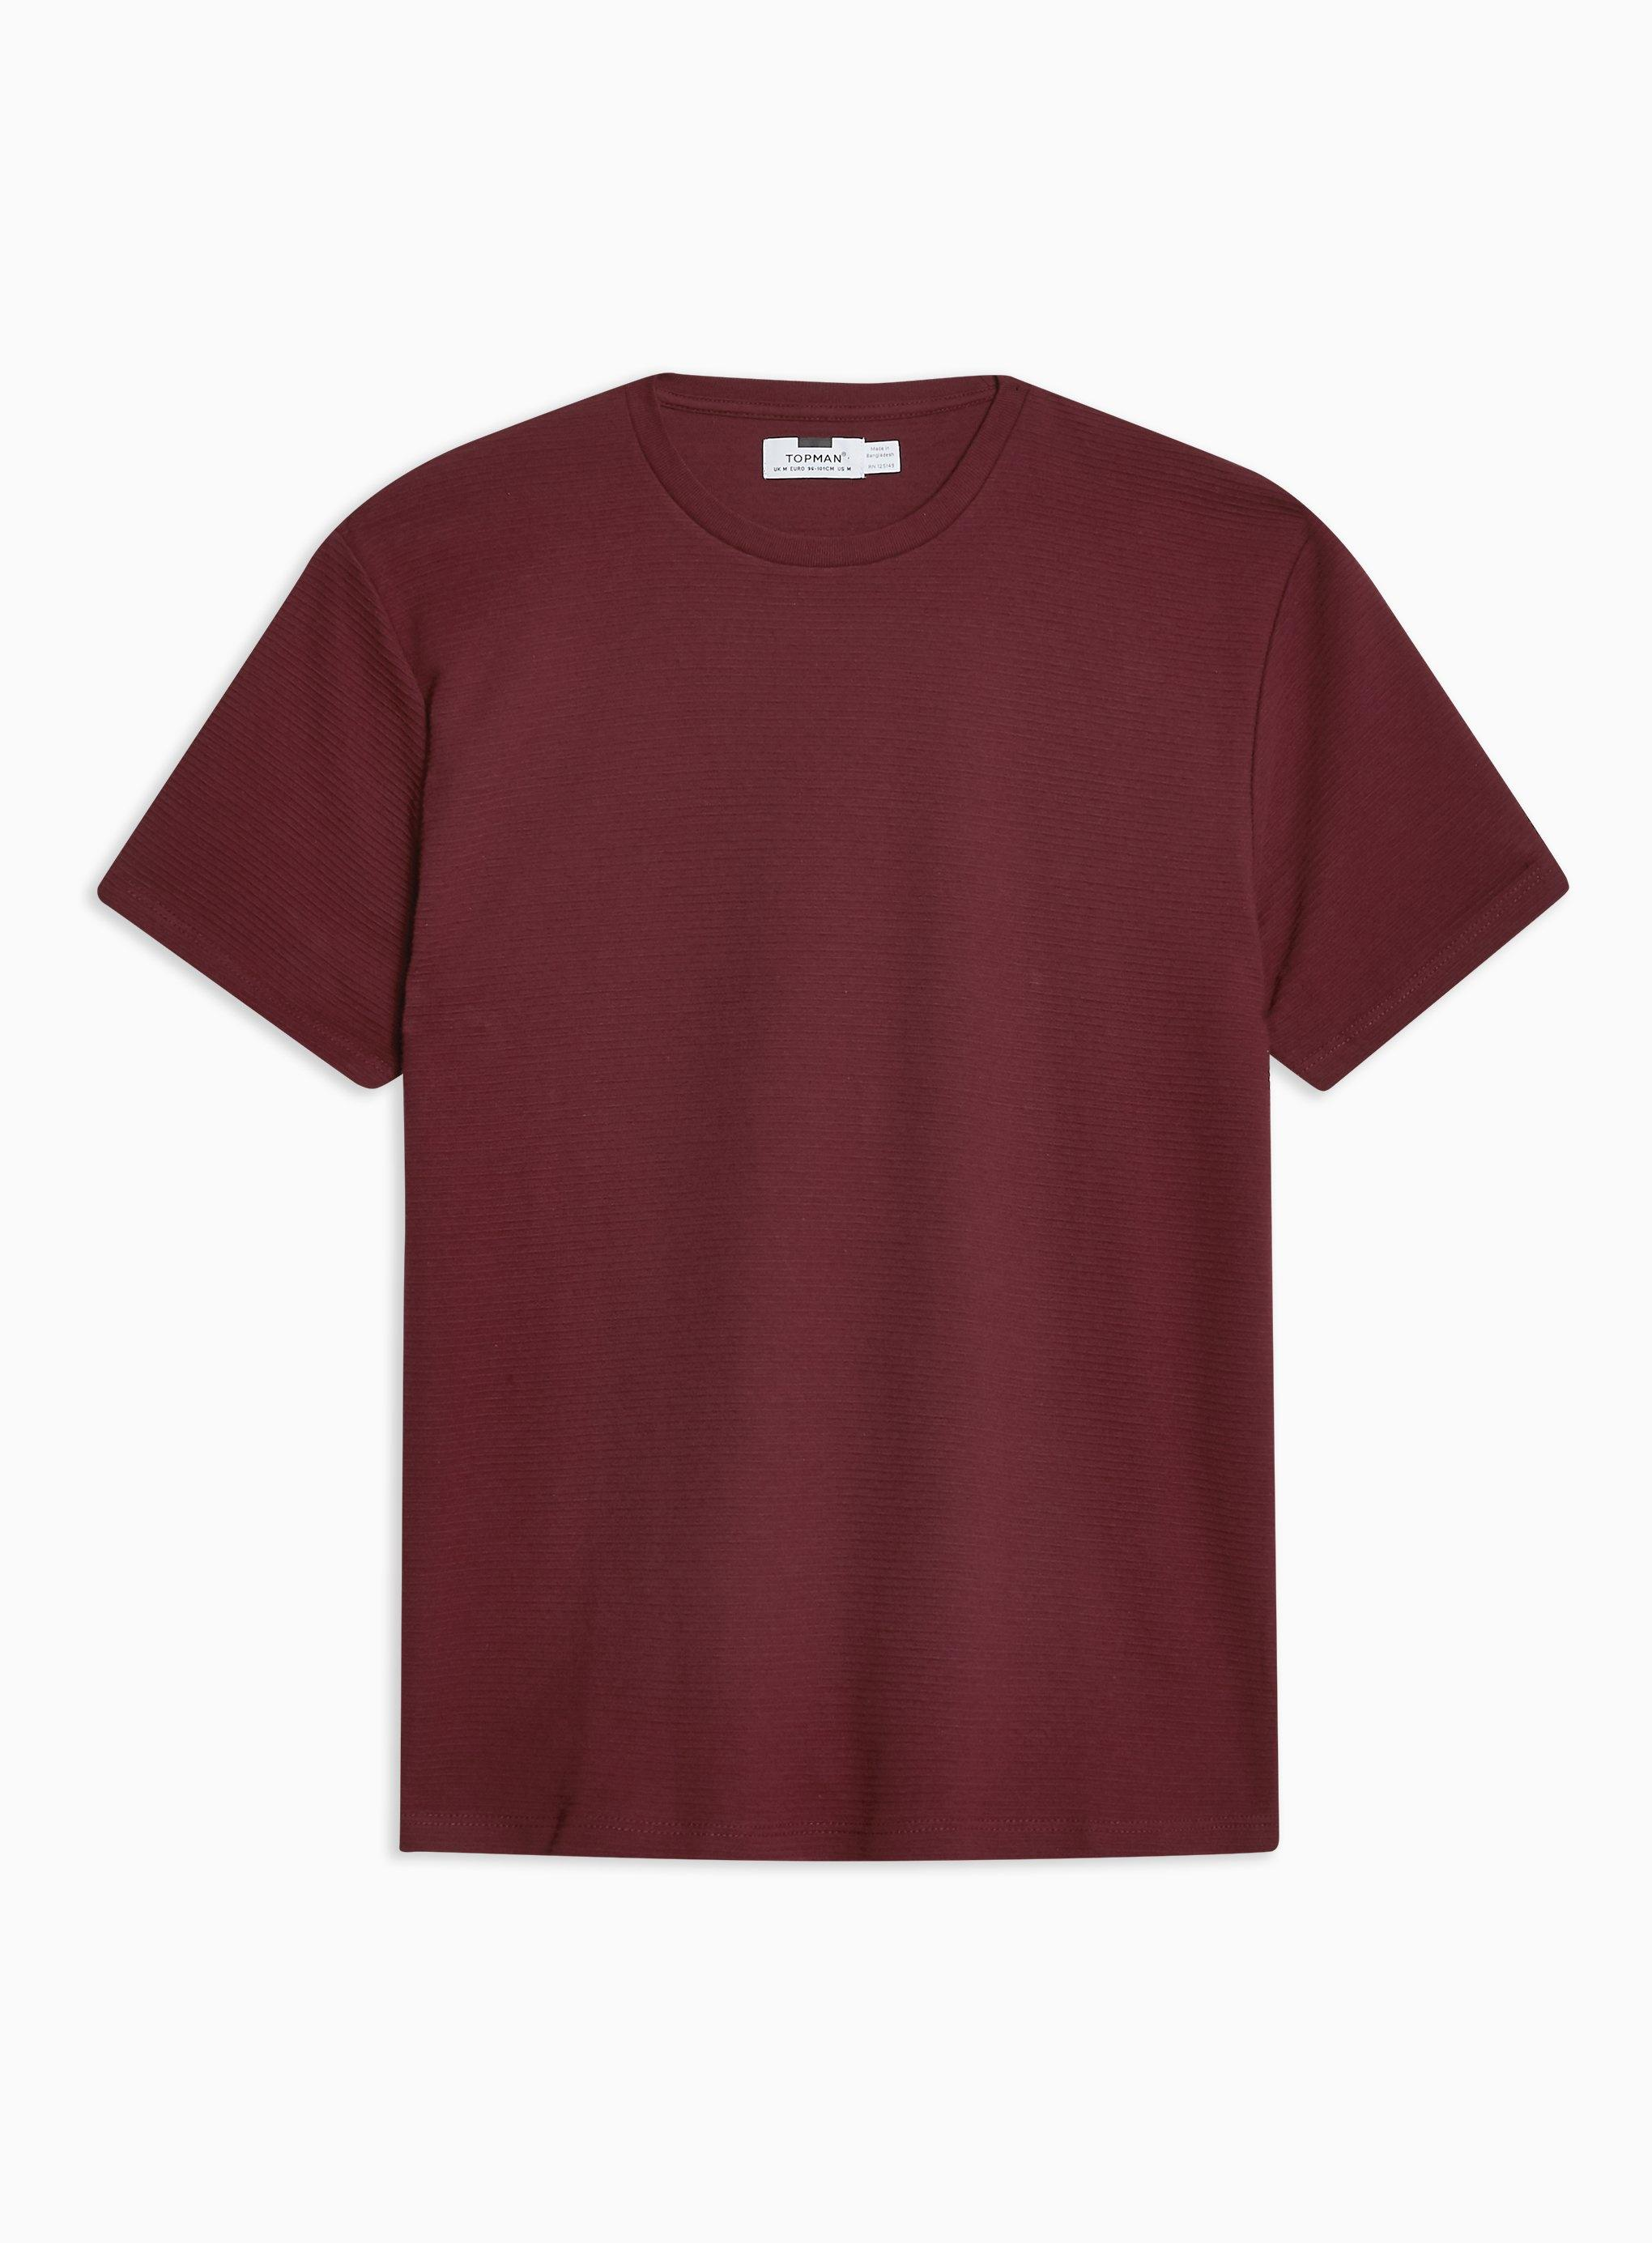 e3d8fb668b35 Topman - Red Burgundy Ottoman T-shirt for Men - Lyst. View fullscreen